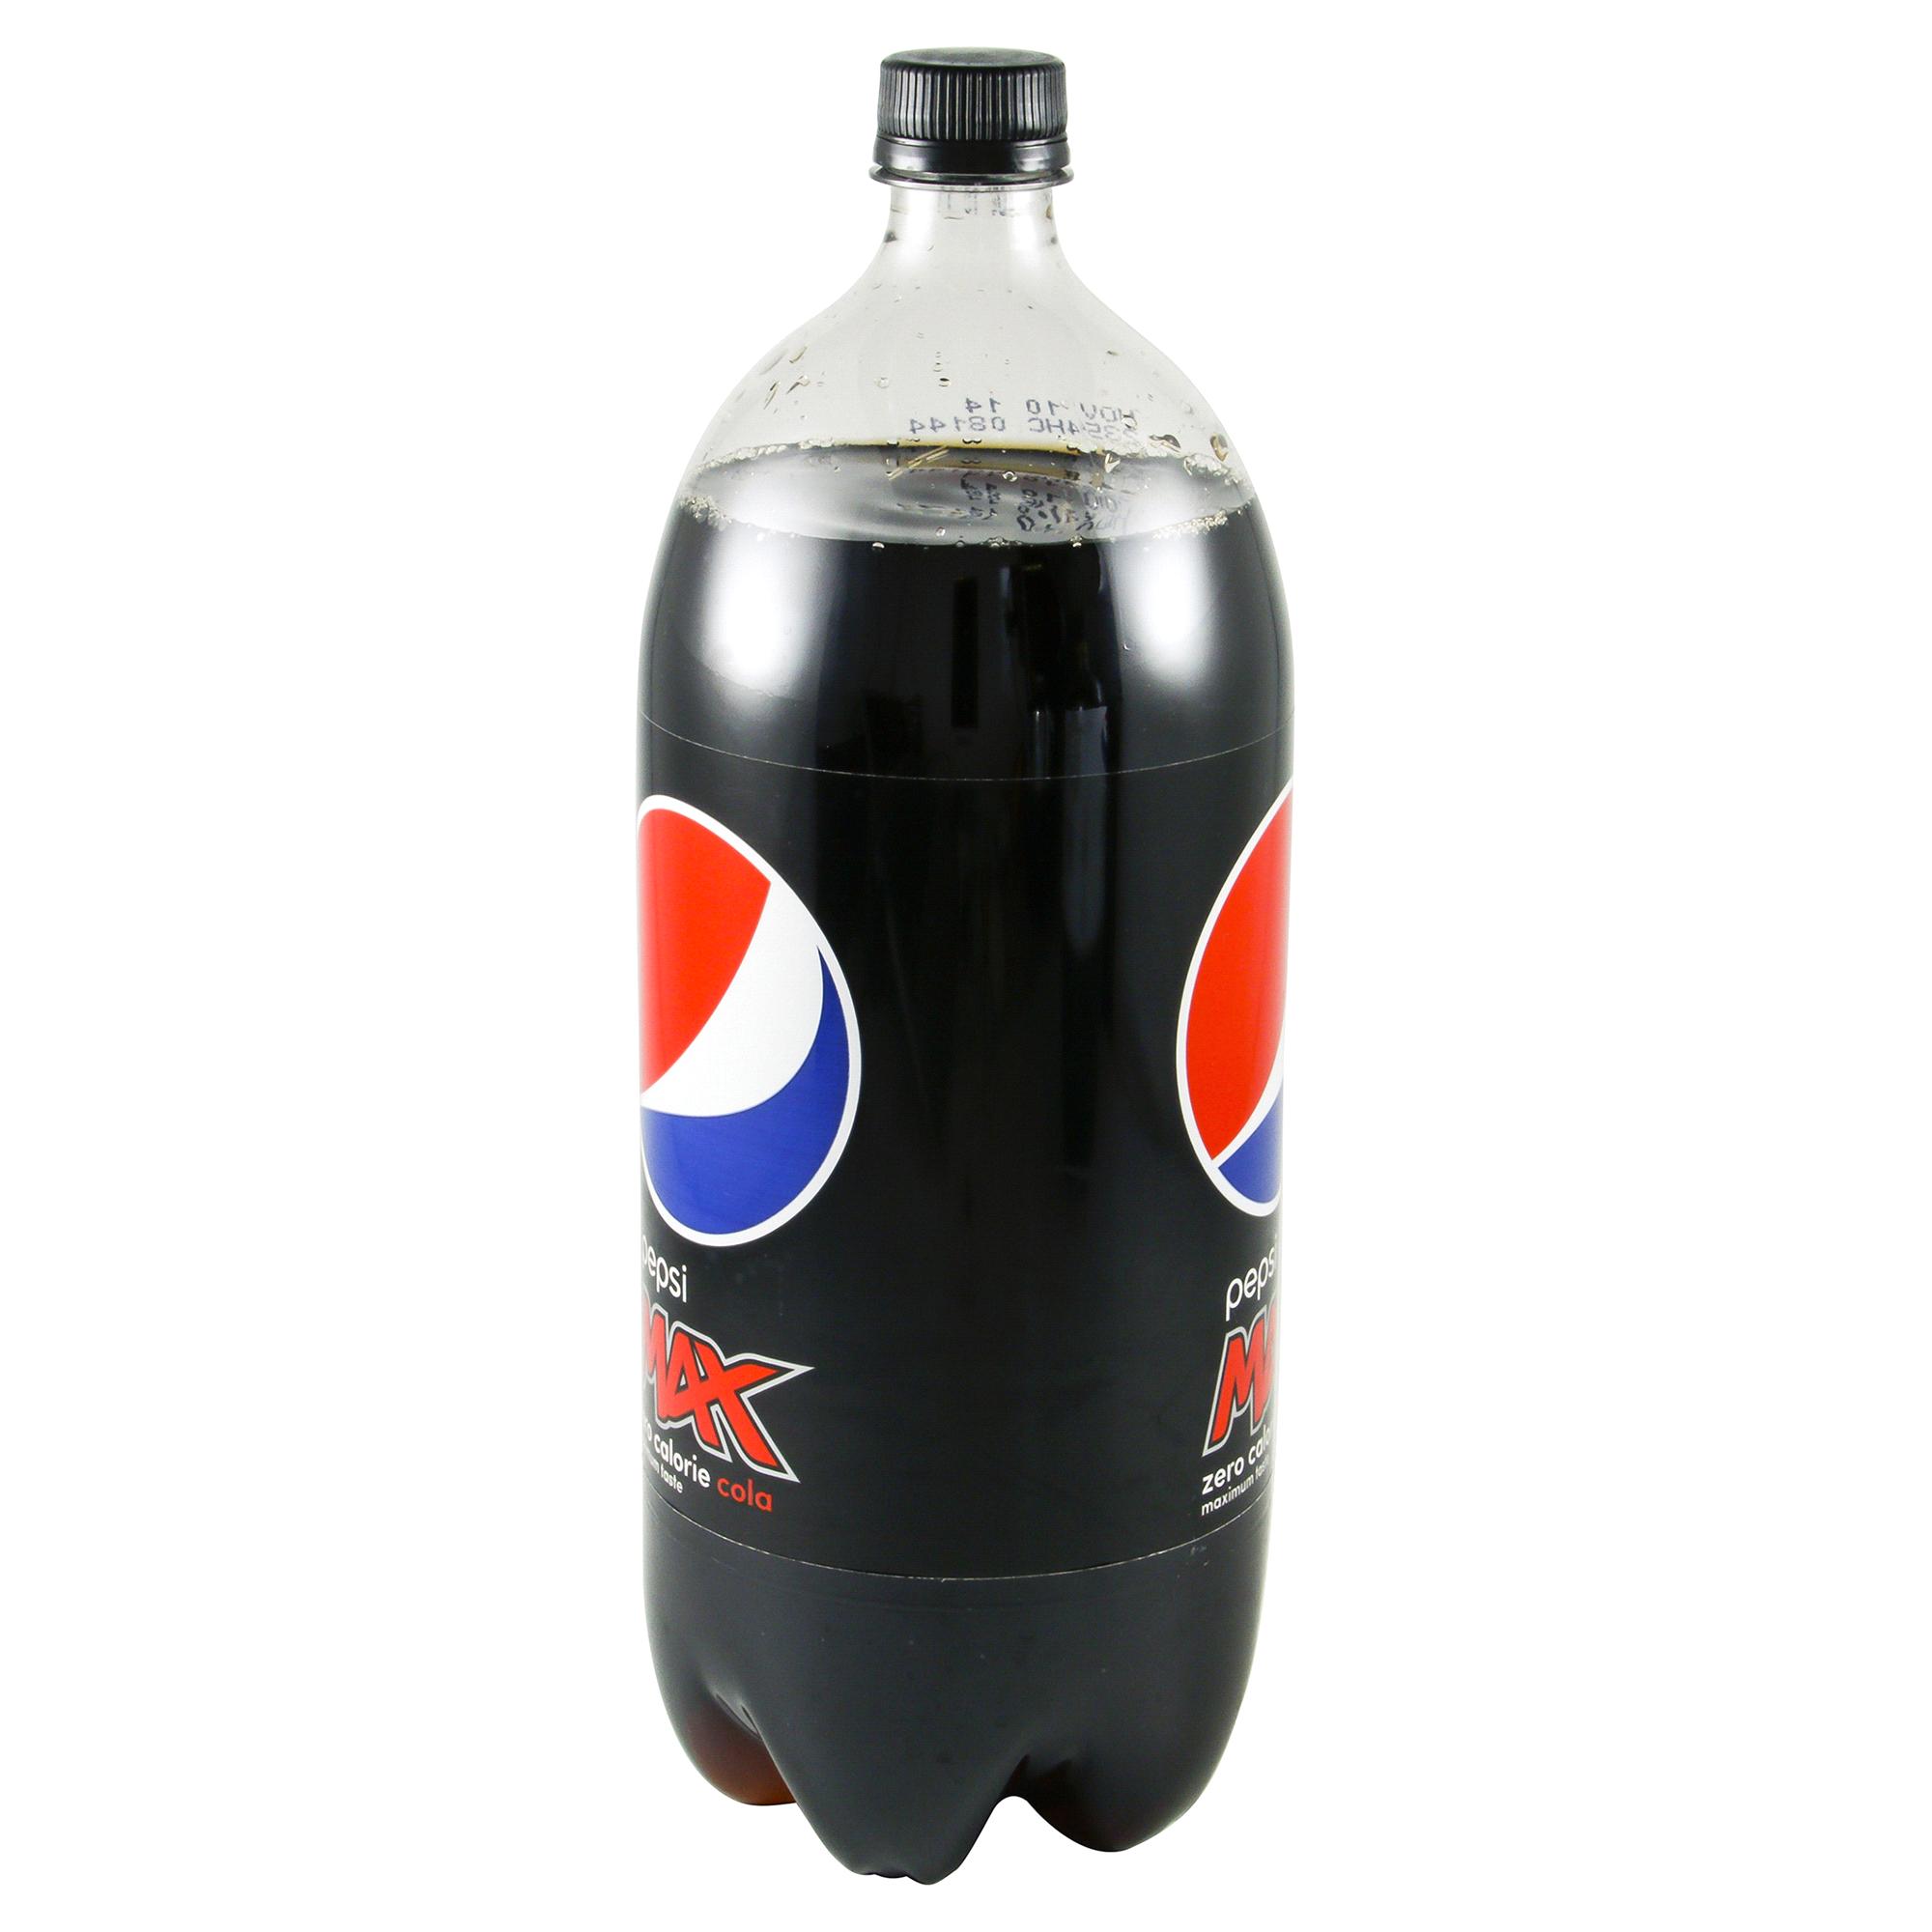 Pepsi Max 2 liter | Meijer.com